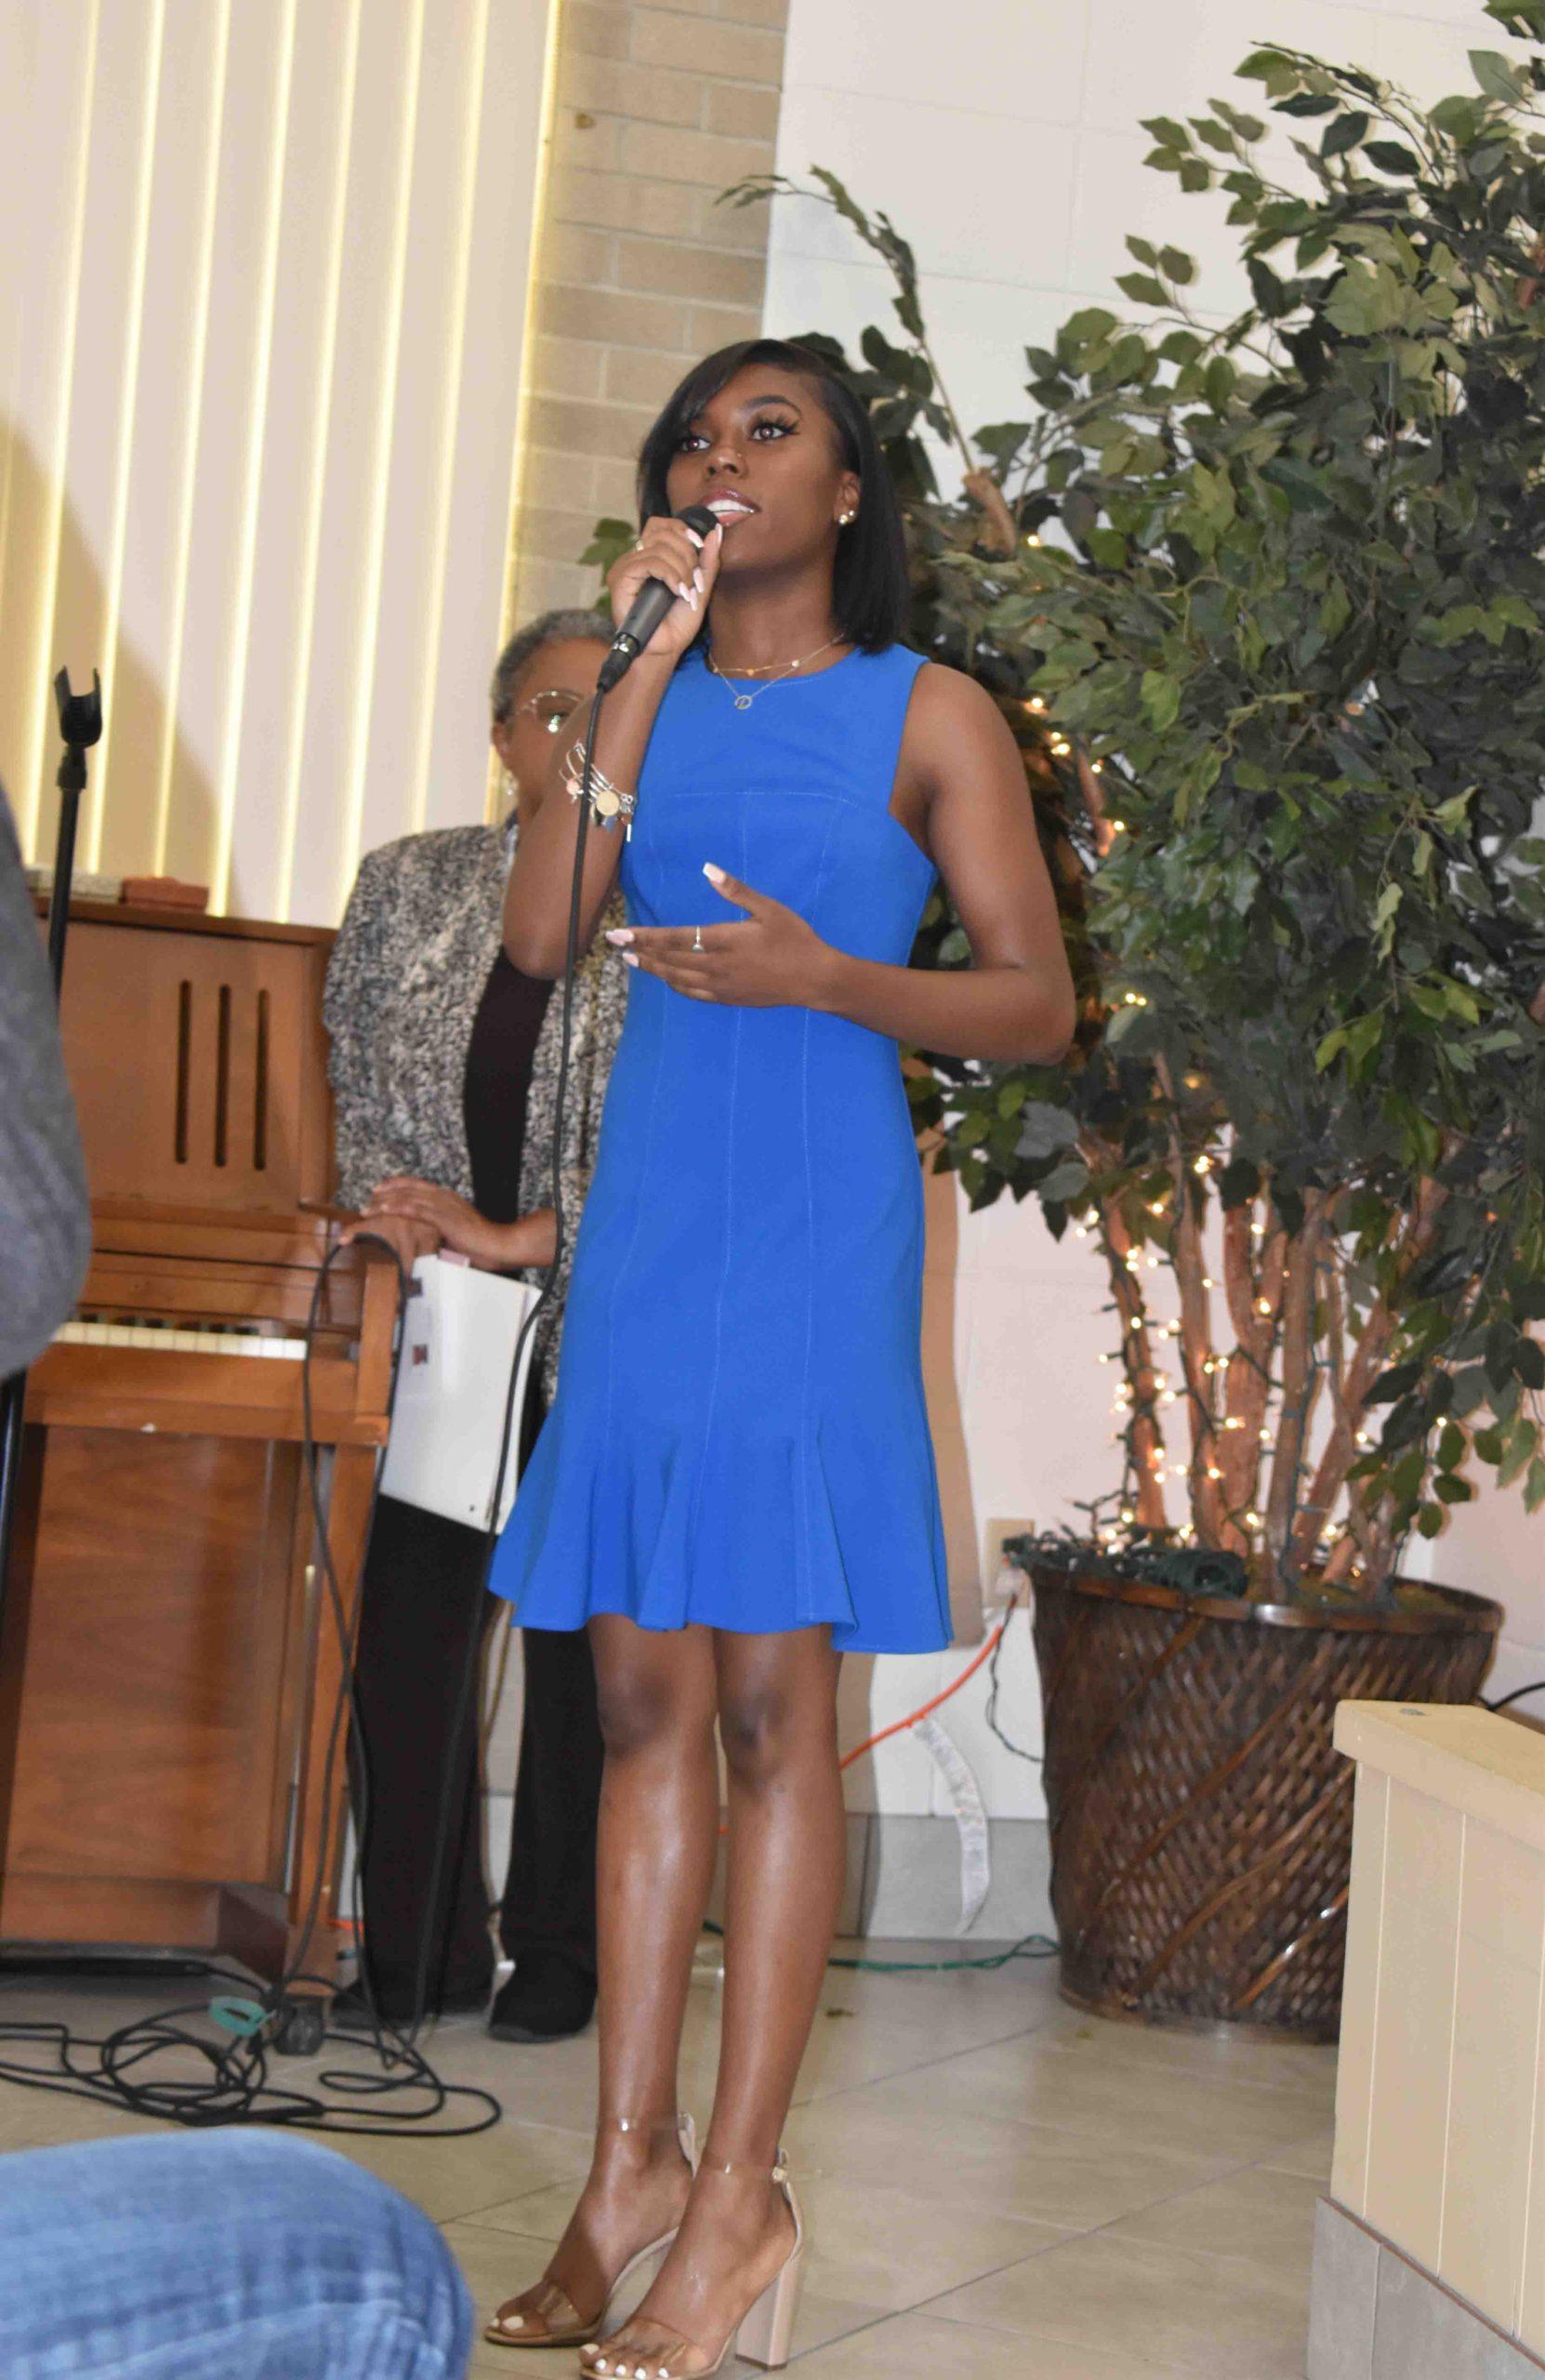 London Jones performs Cynthia Erivo's 'Stand Up'